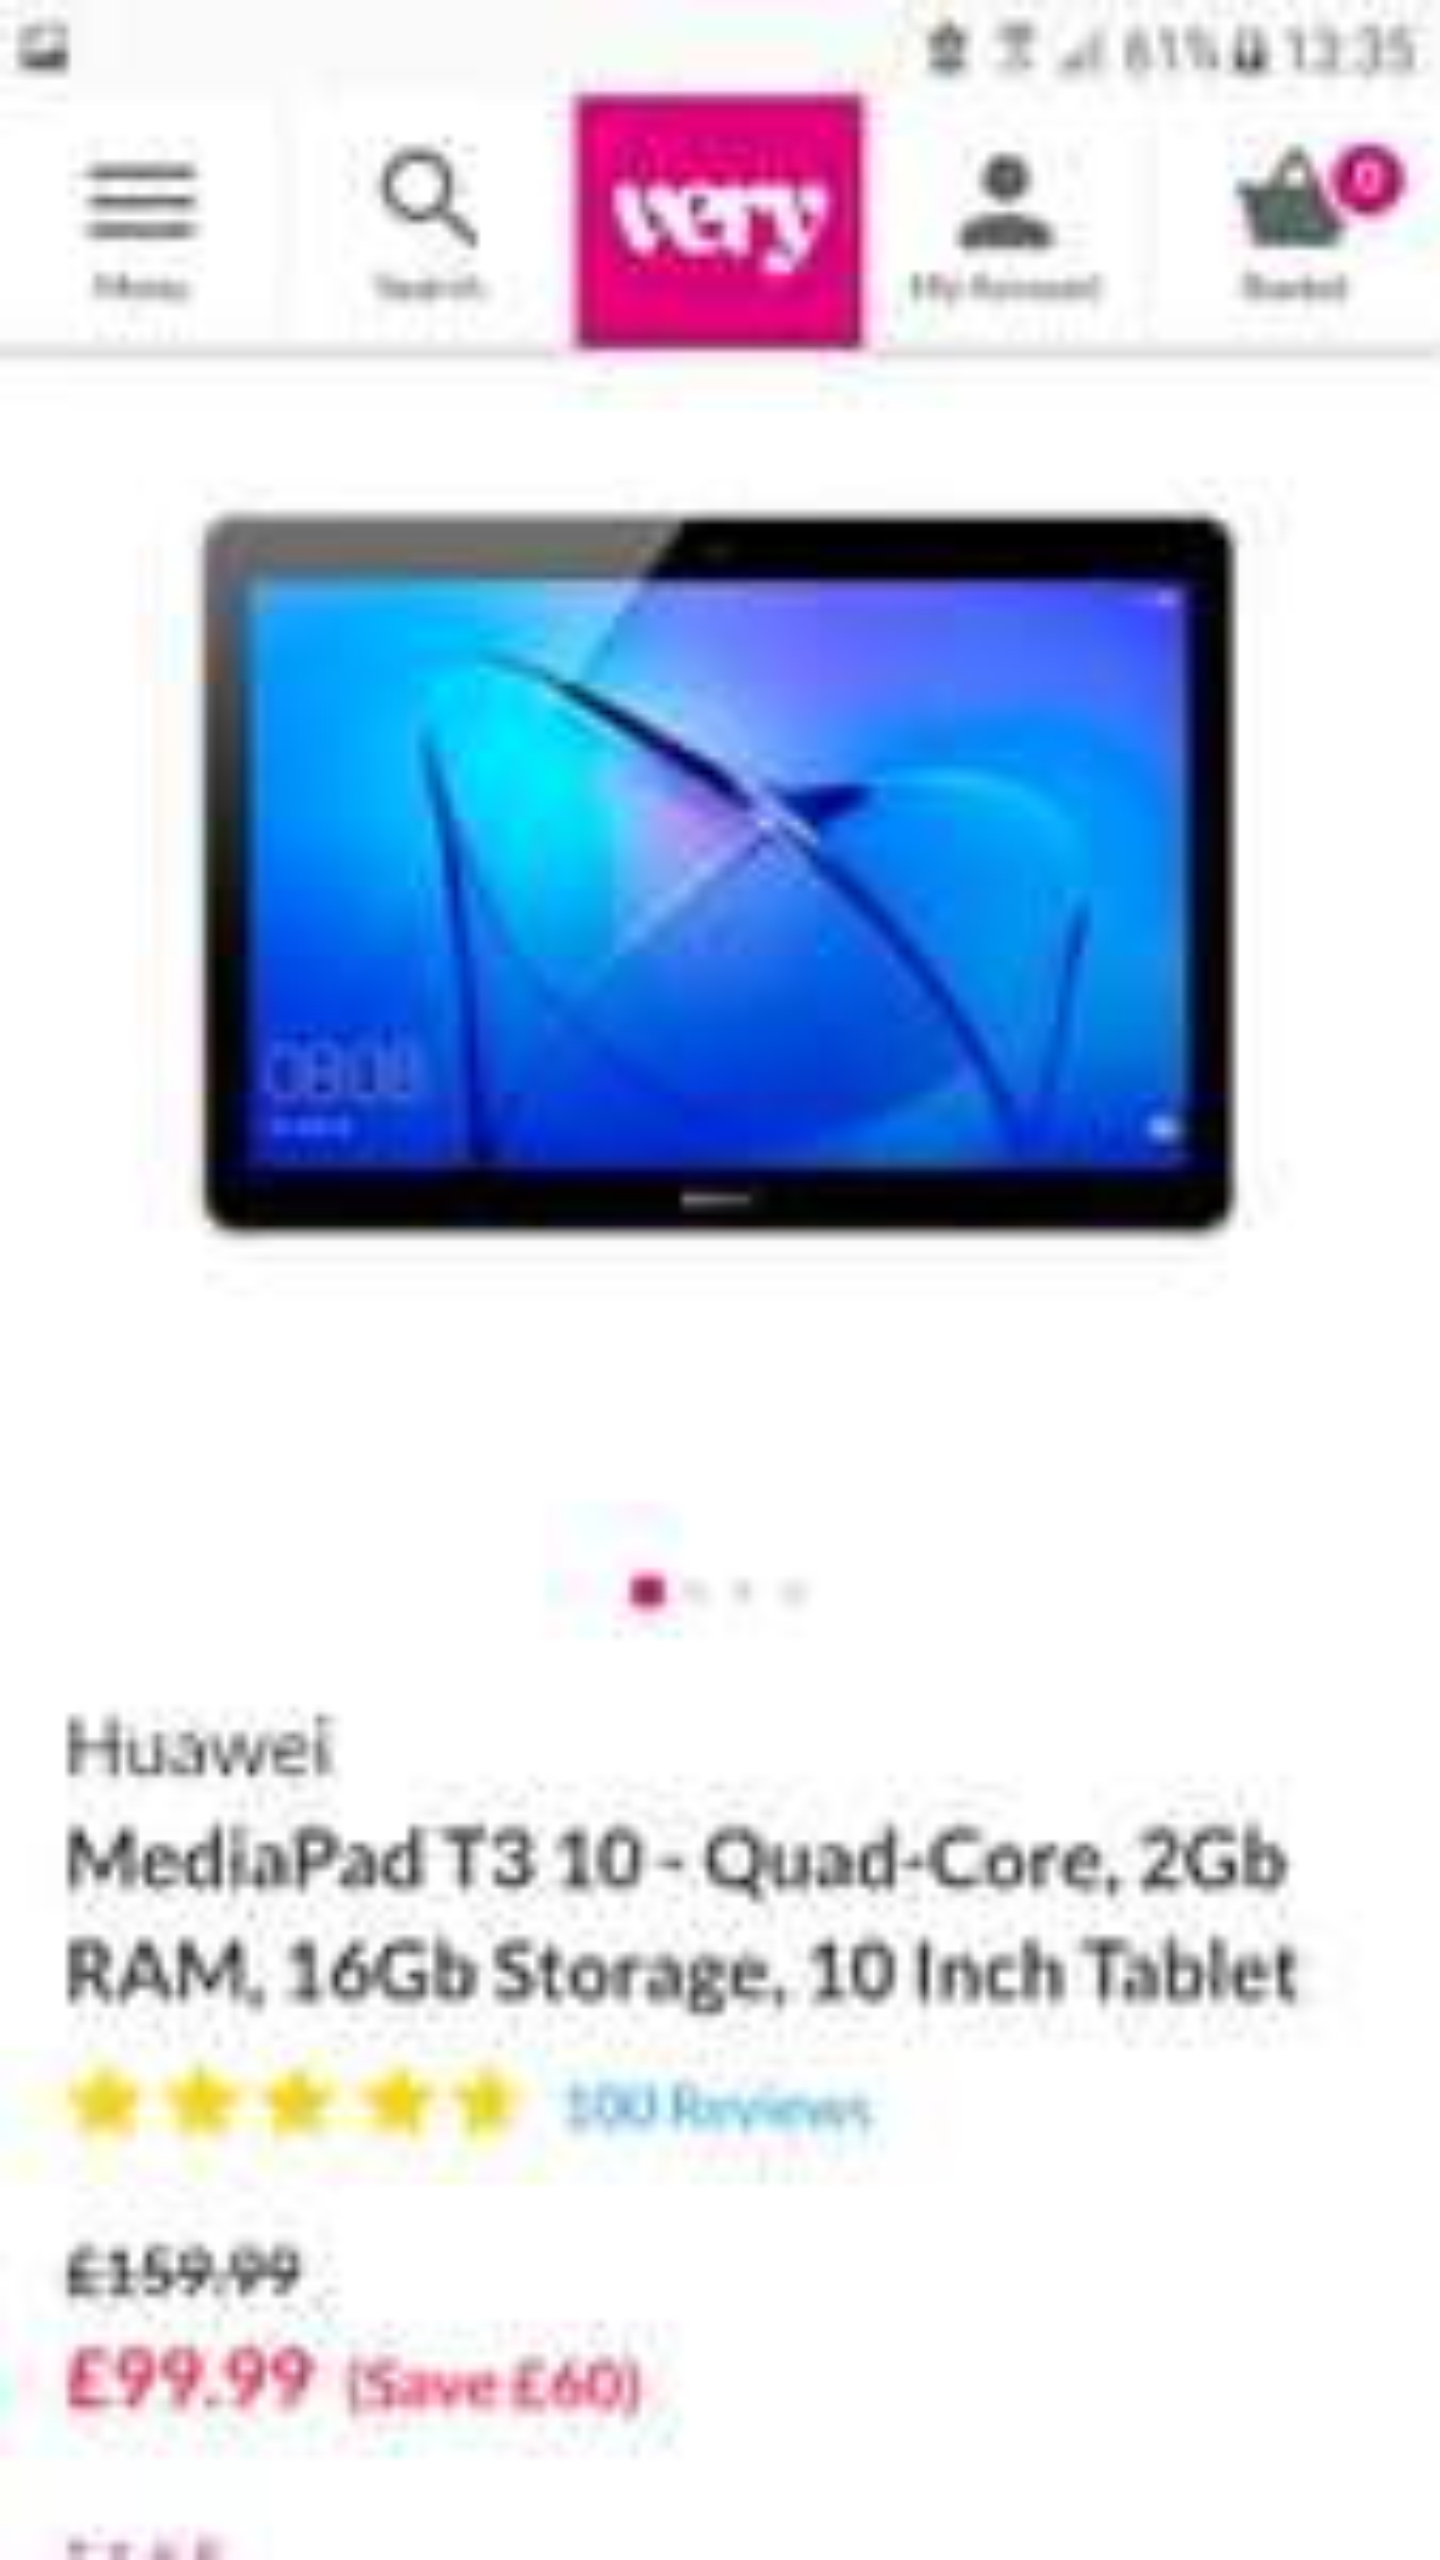 Hauwei Mediapad T3 10inch 16GB £99.99 @ Very